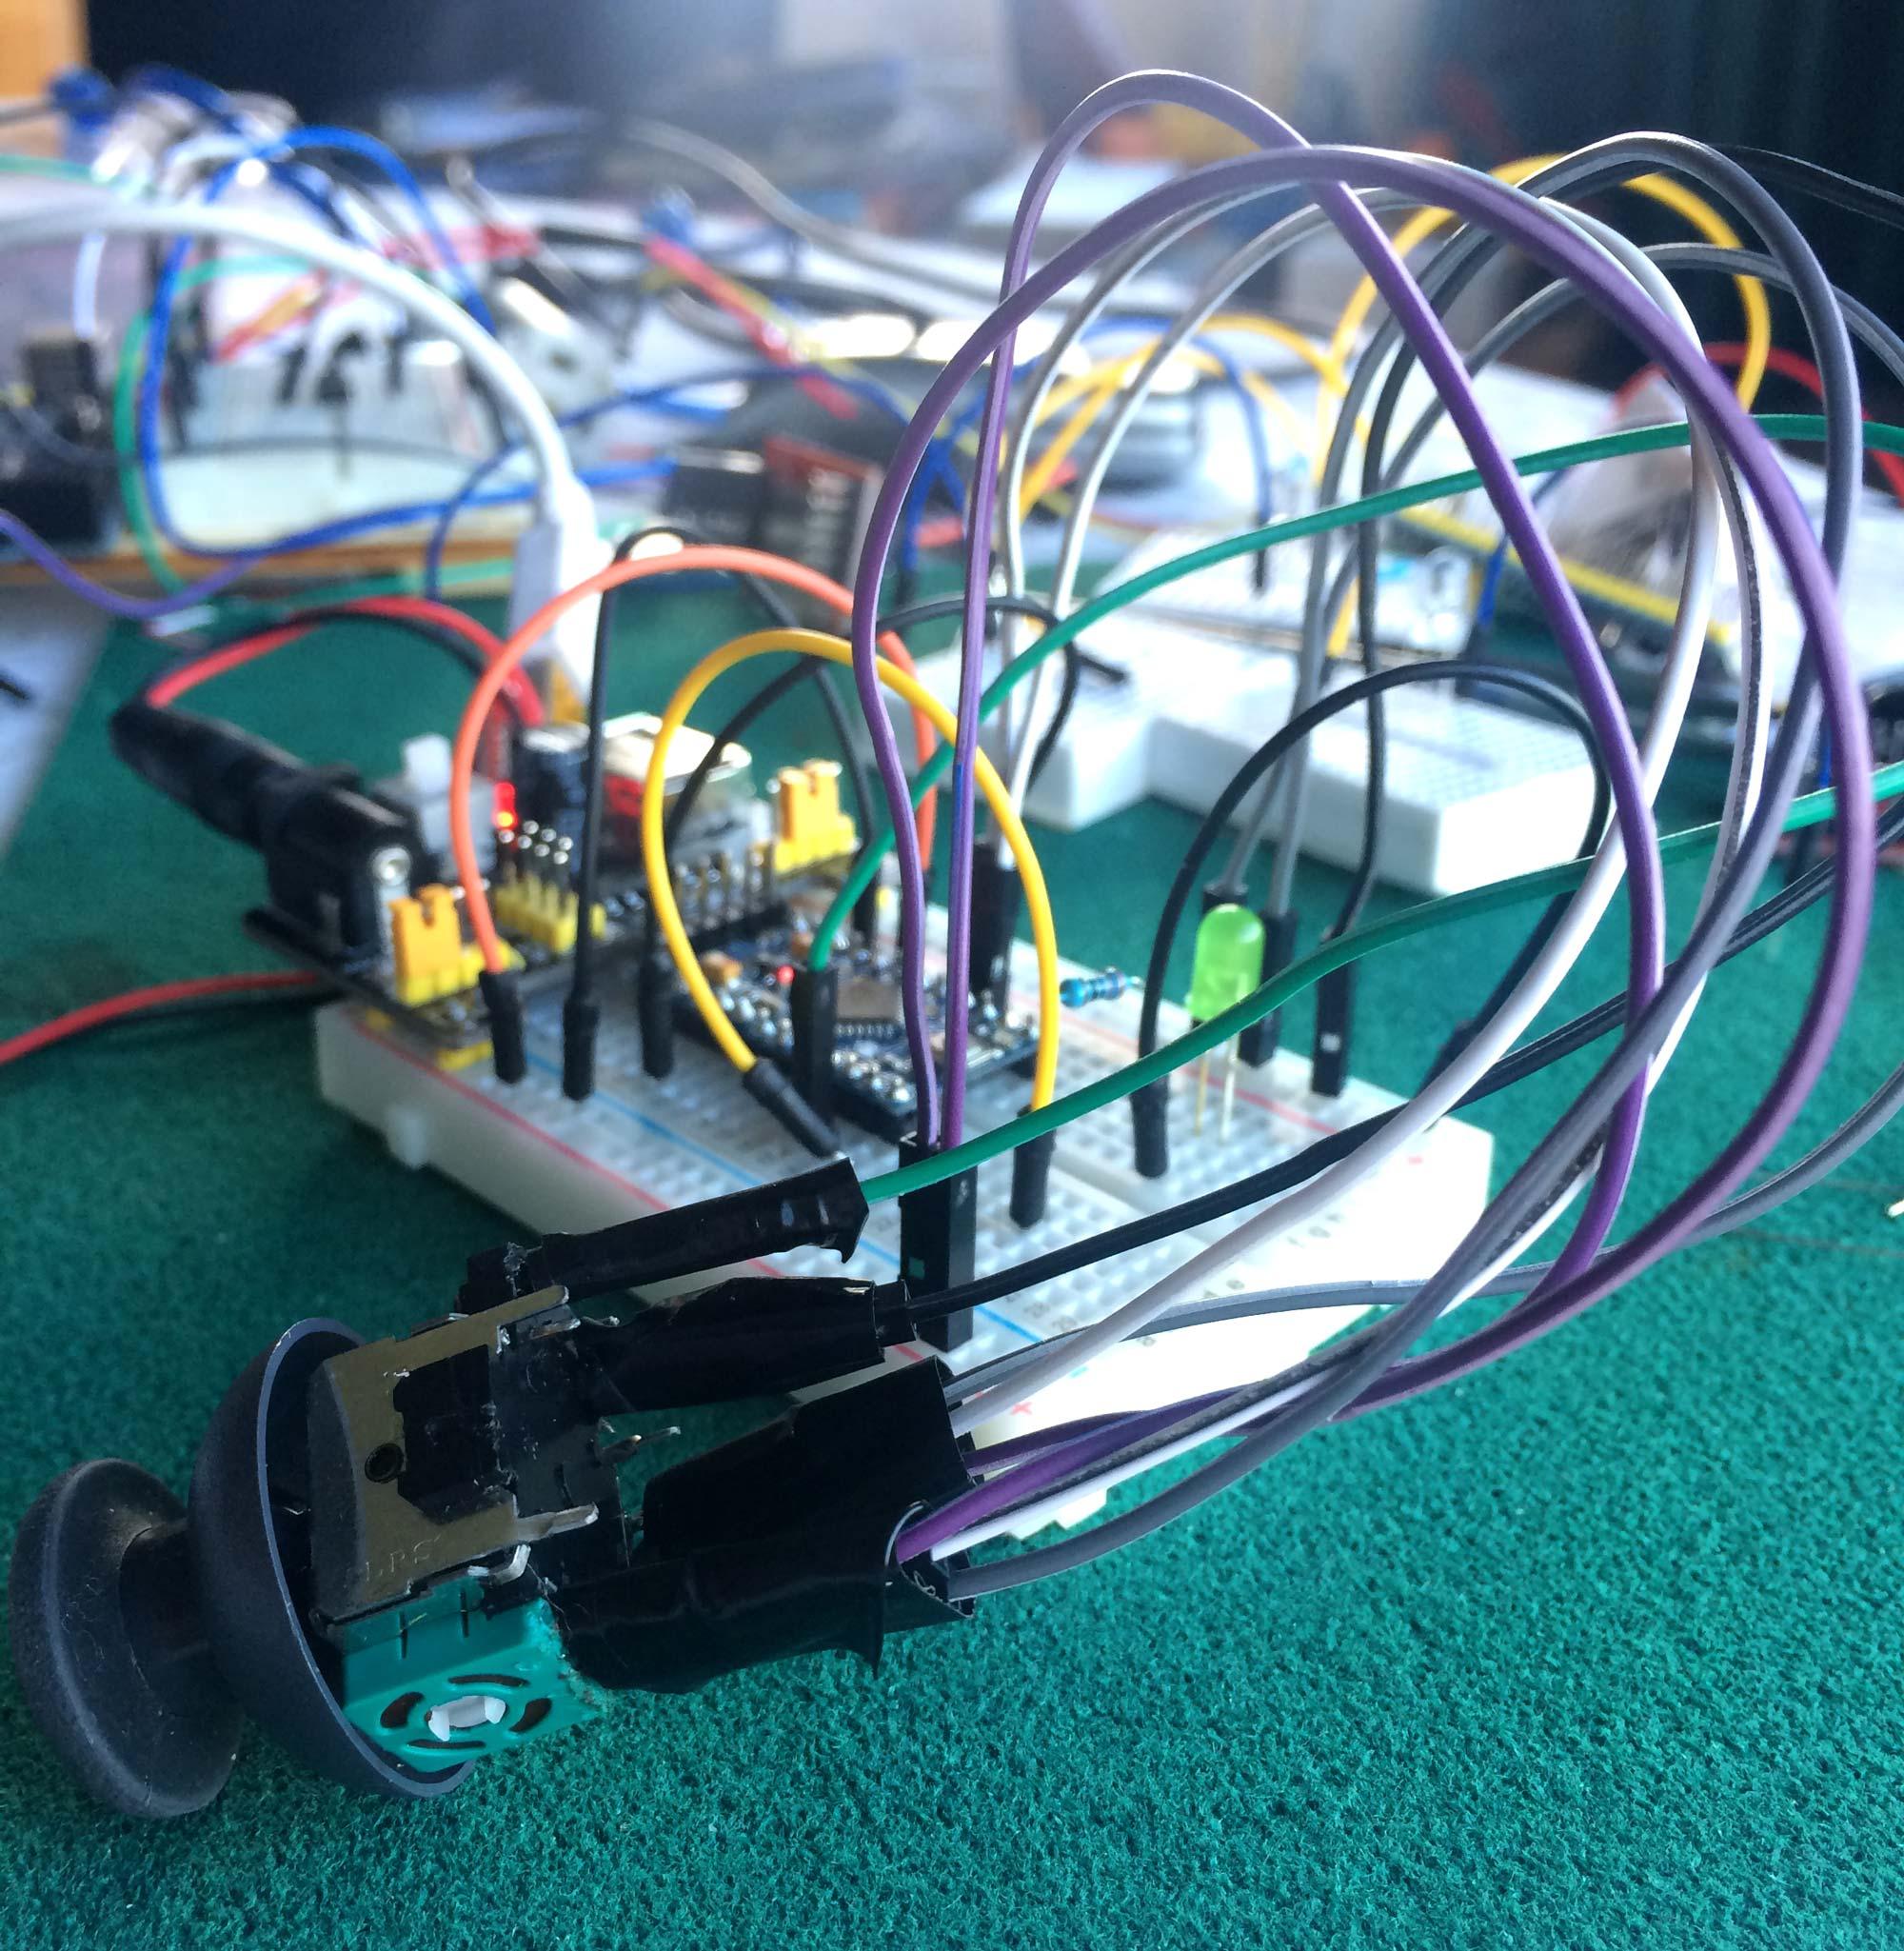 Analog Joystick Wiring Diagram Schematic Electronic 93 Chevy Suburban 2500 454 Starter